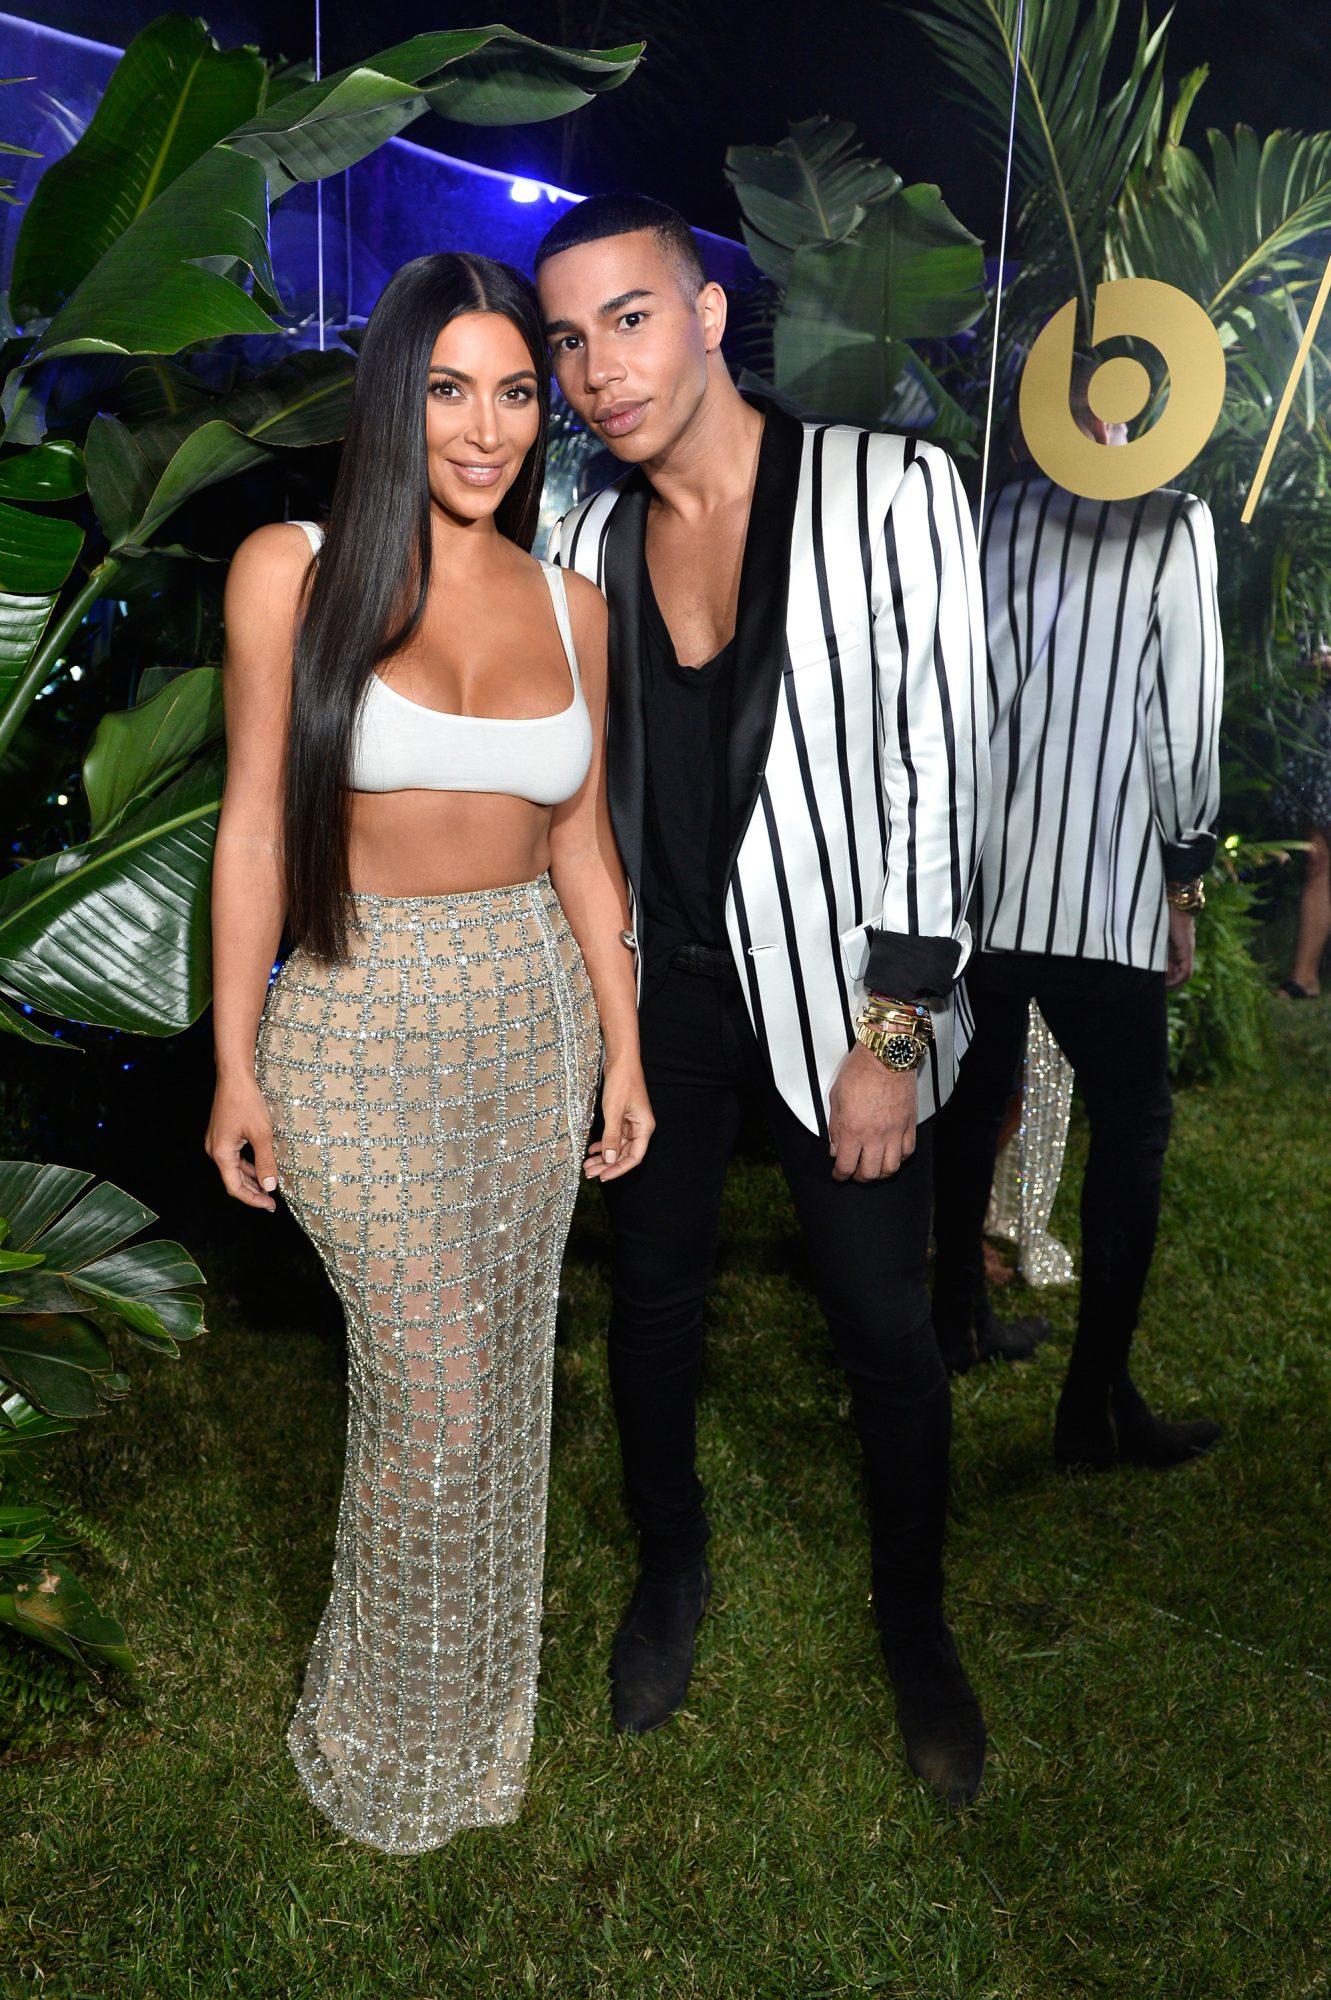 Kim Kardashian (L) and designer Olivier Rousteing